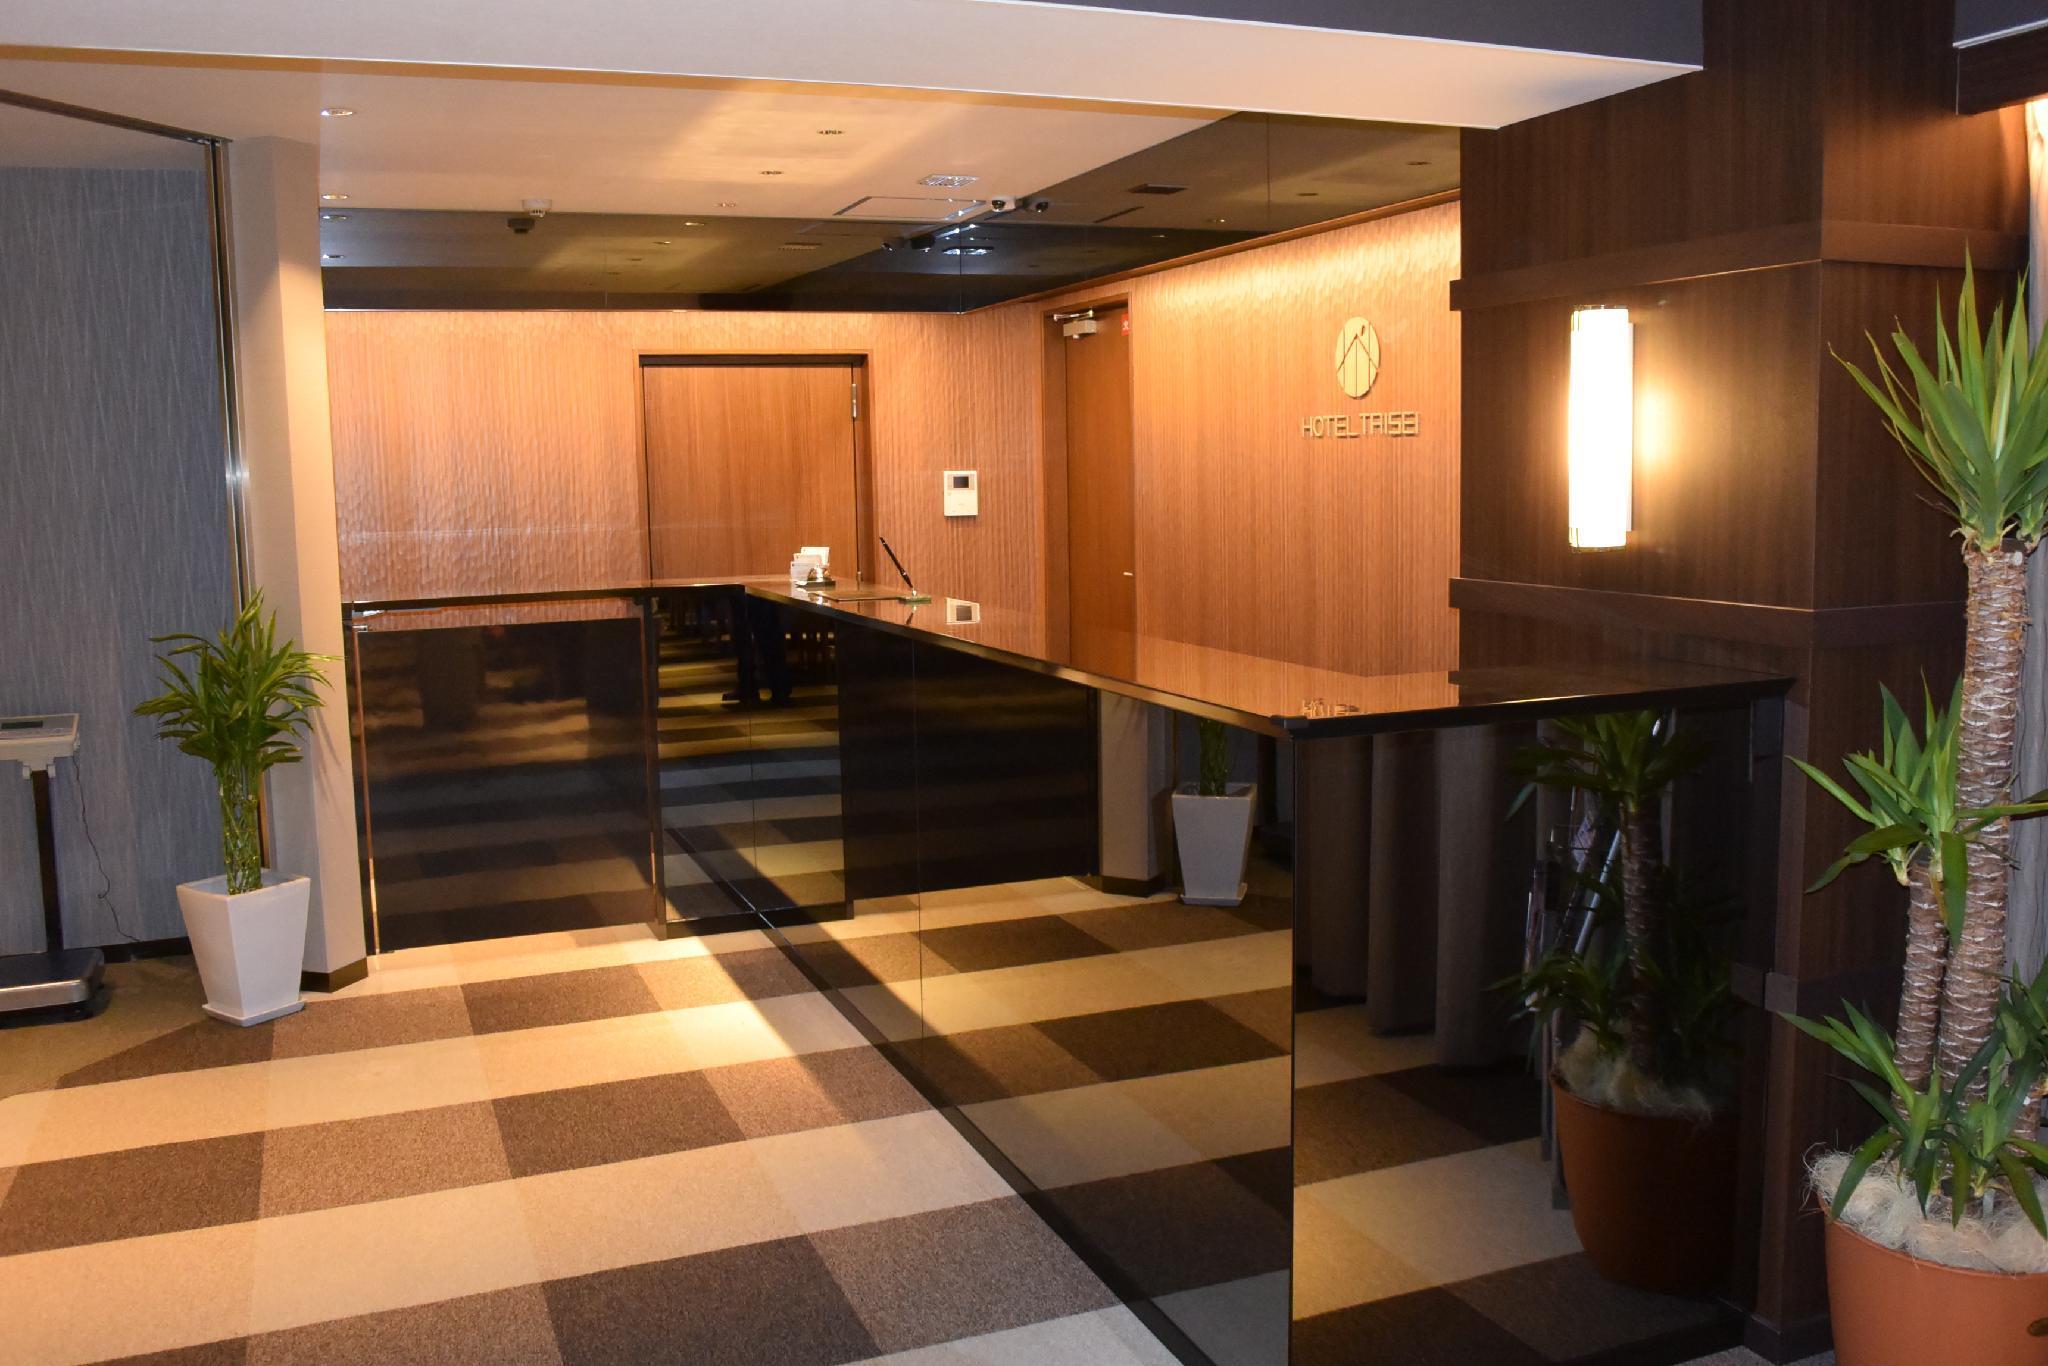 Promo [75% Off] Hotel Taisei Japan | Skirt W Hotel Promotion